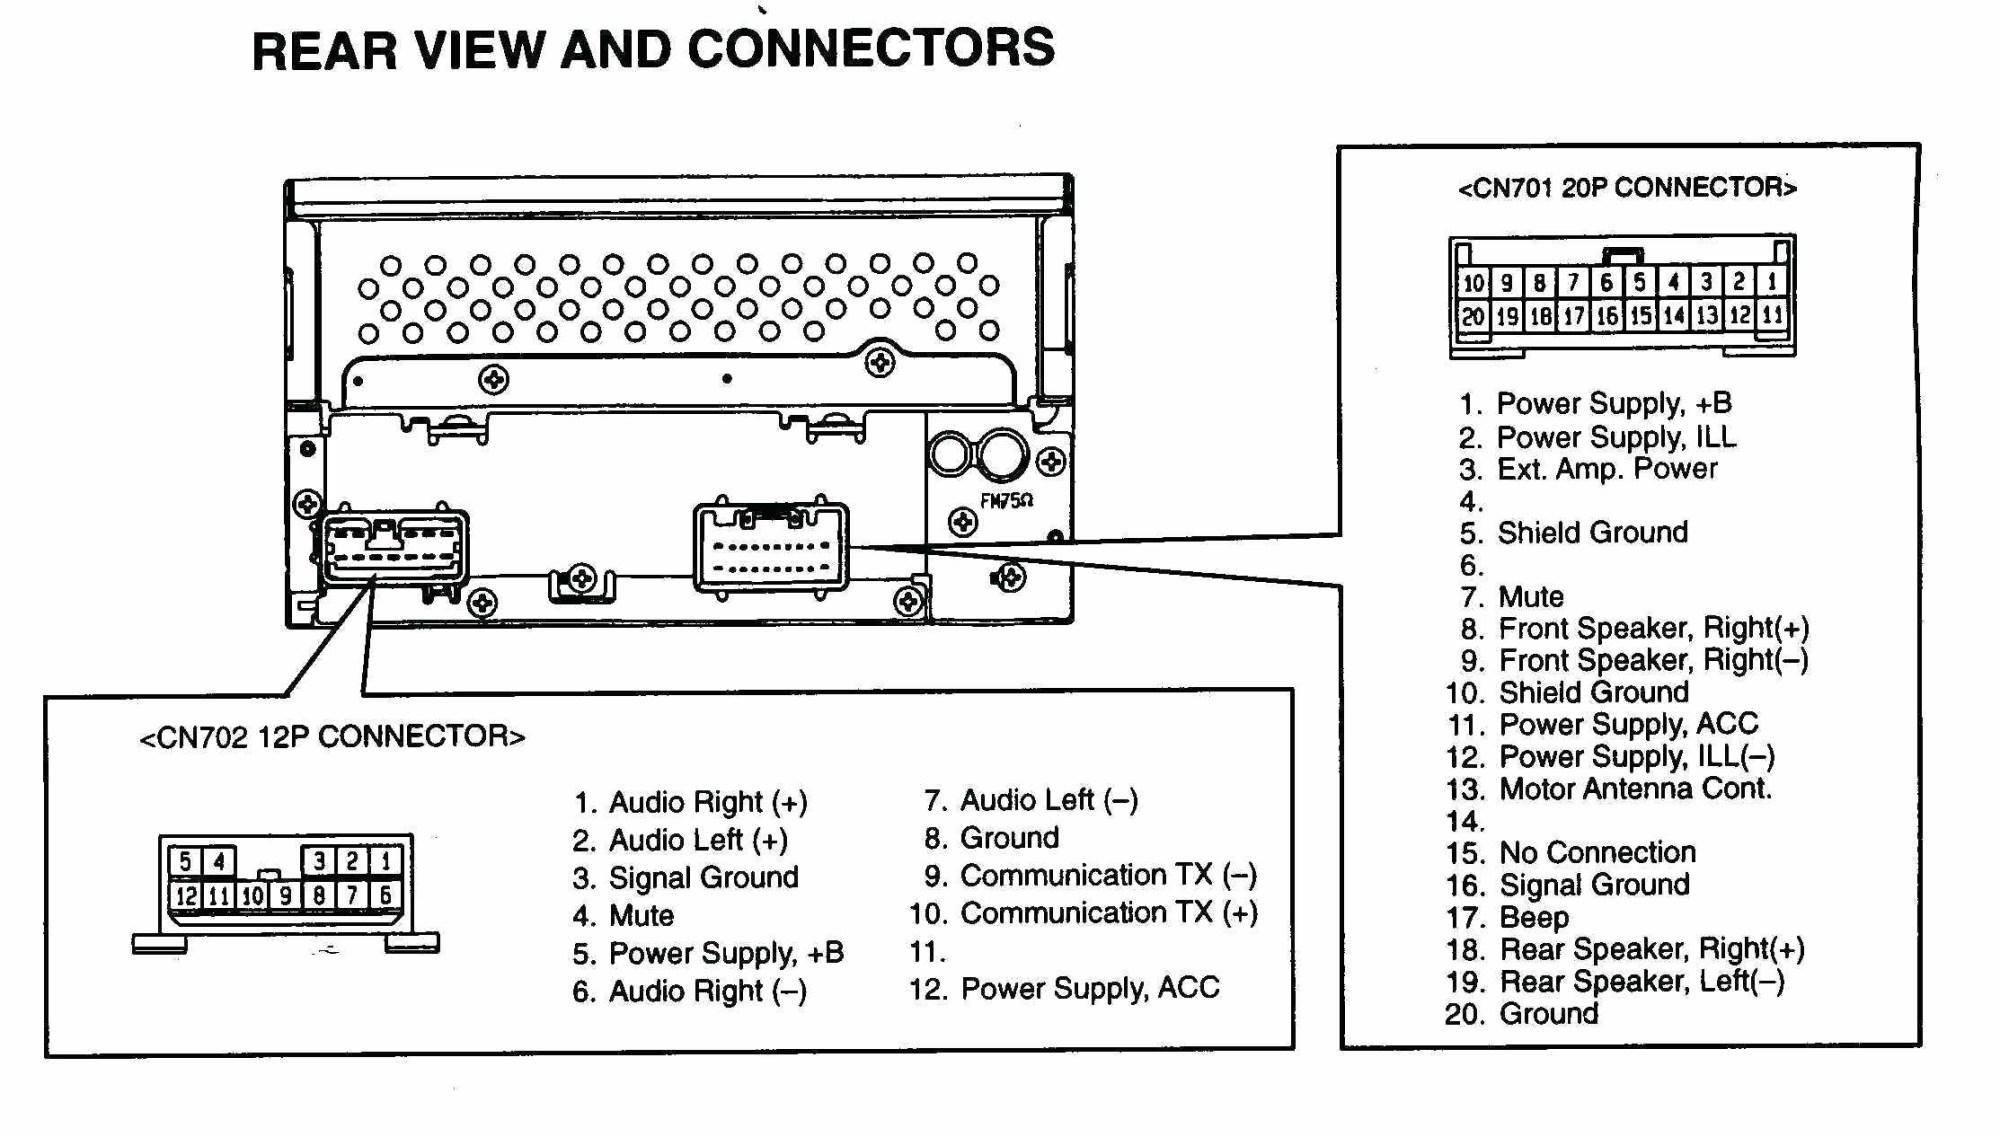 hight resolution of kenwood ddx514 wiring diagram 4 12 artatec automobile de u2022kenwood ddx514 wiring diagram best wiring